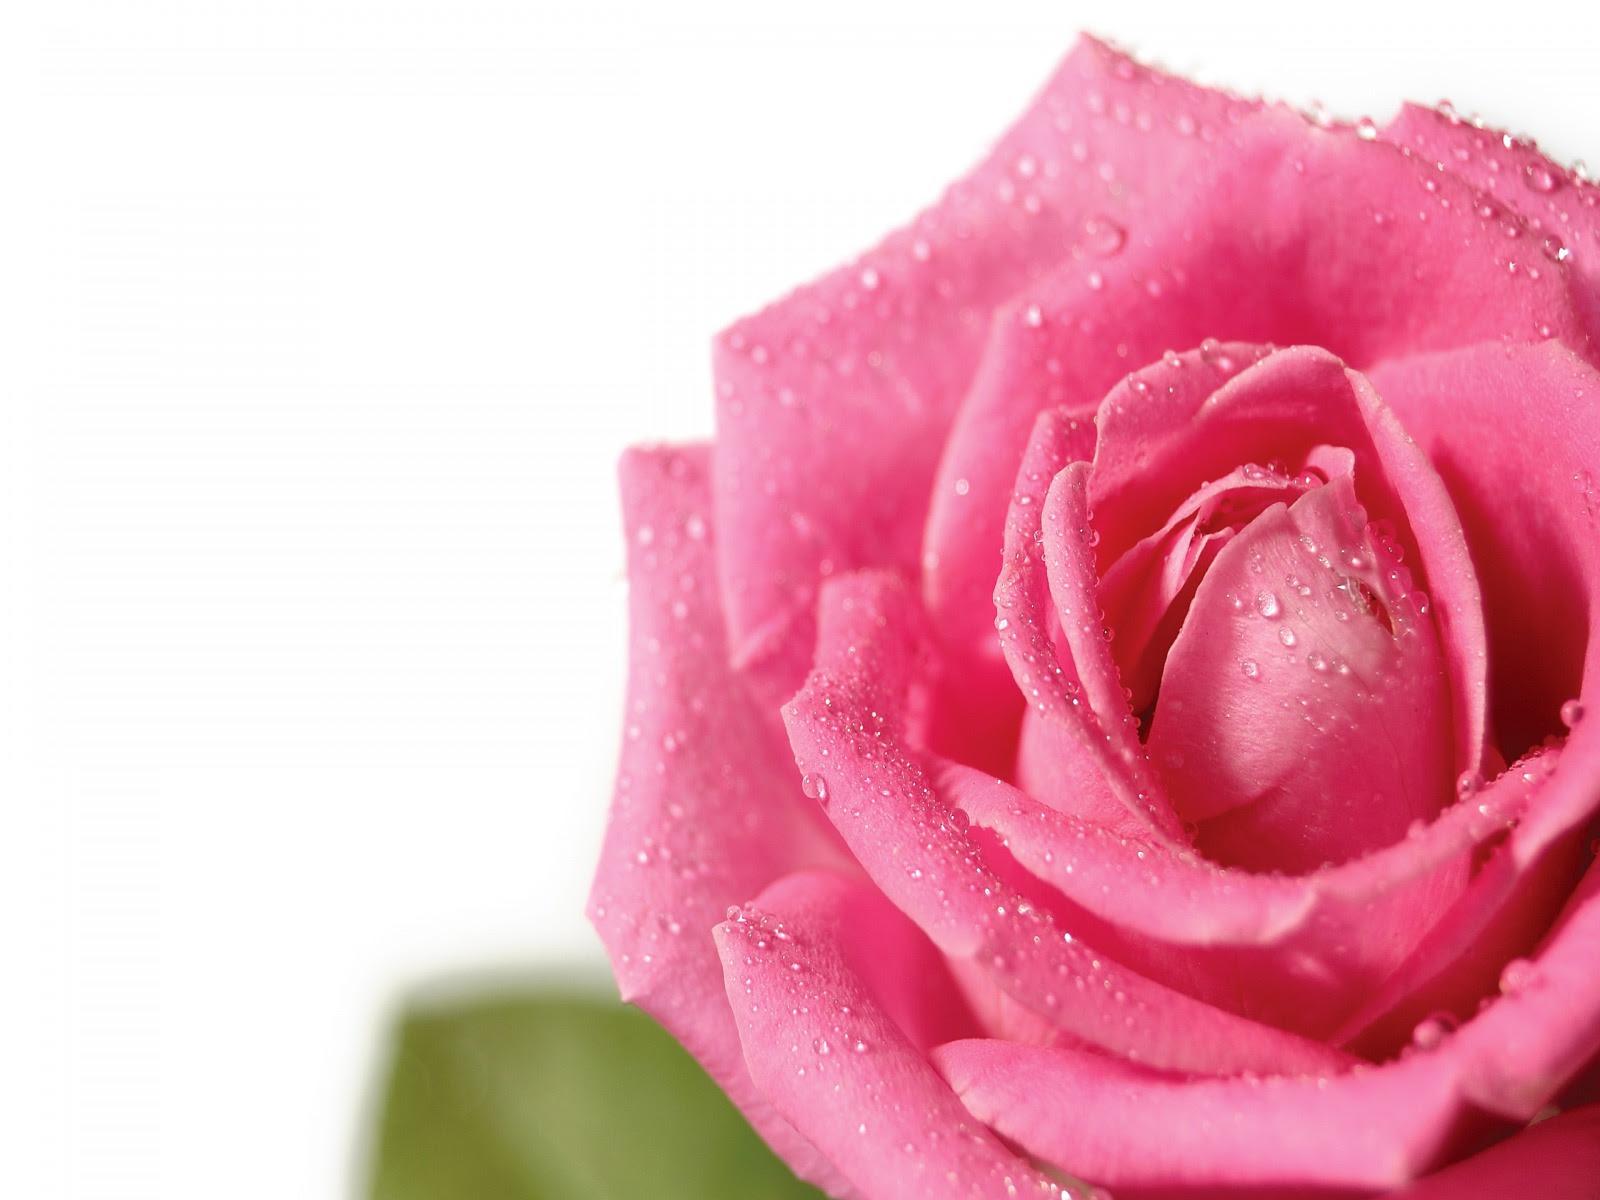 Pretty Pink Rose Wallpaper Colors Wallpaper 34511726 Fanpop Page 6